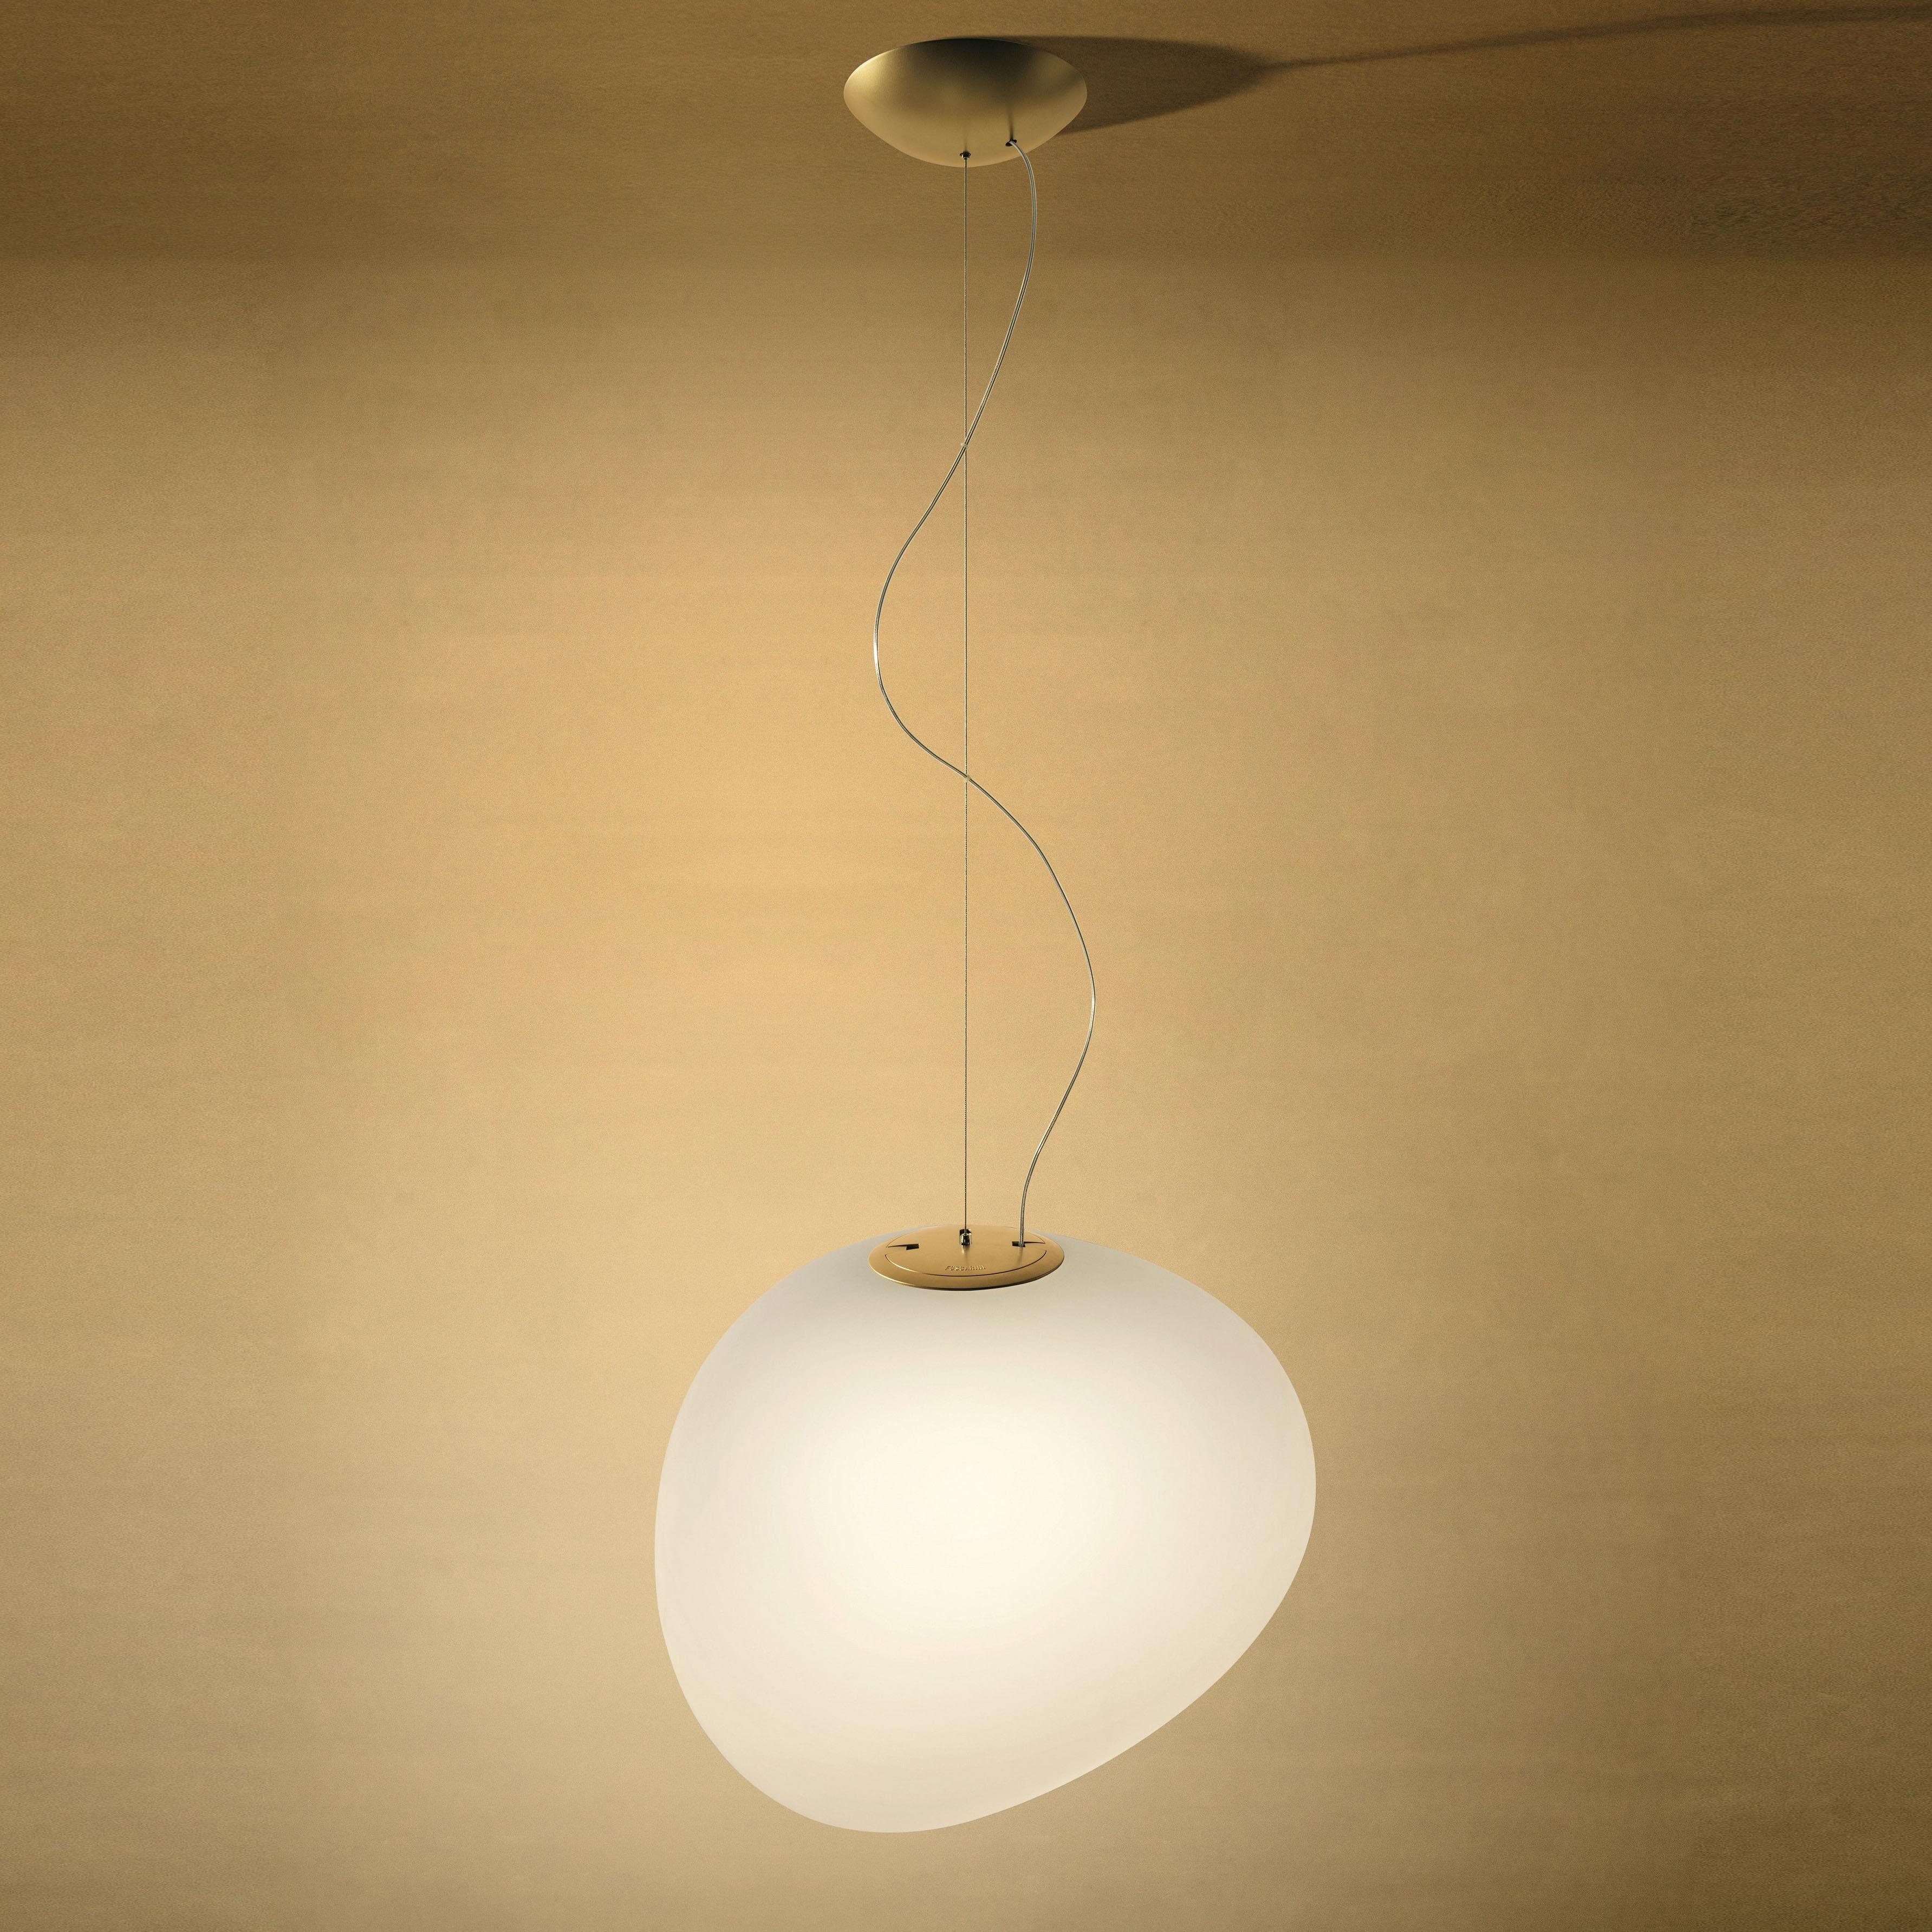 Luminaire - Suspensions - Suspension Gregg Grande LED My Light / Verre - L 47 cm / Bluetooth - Foscarini - Blanc - Métal laqué, Verre soufflé